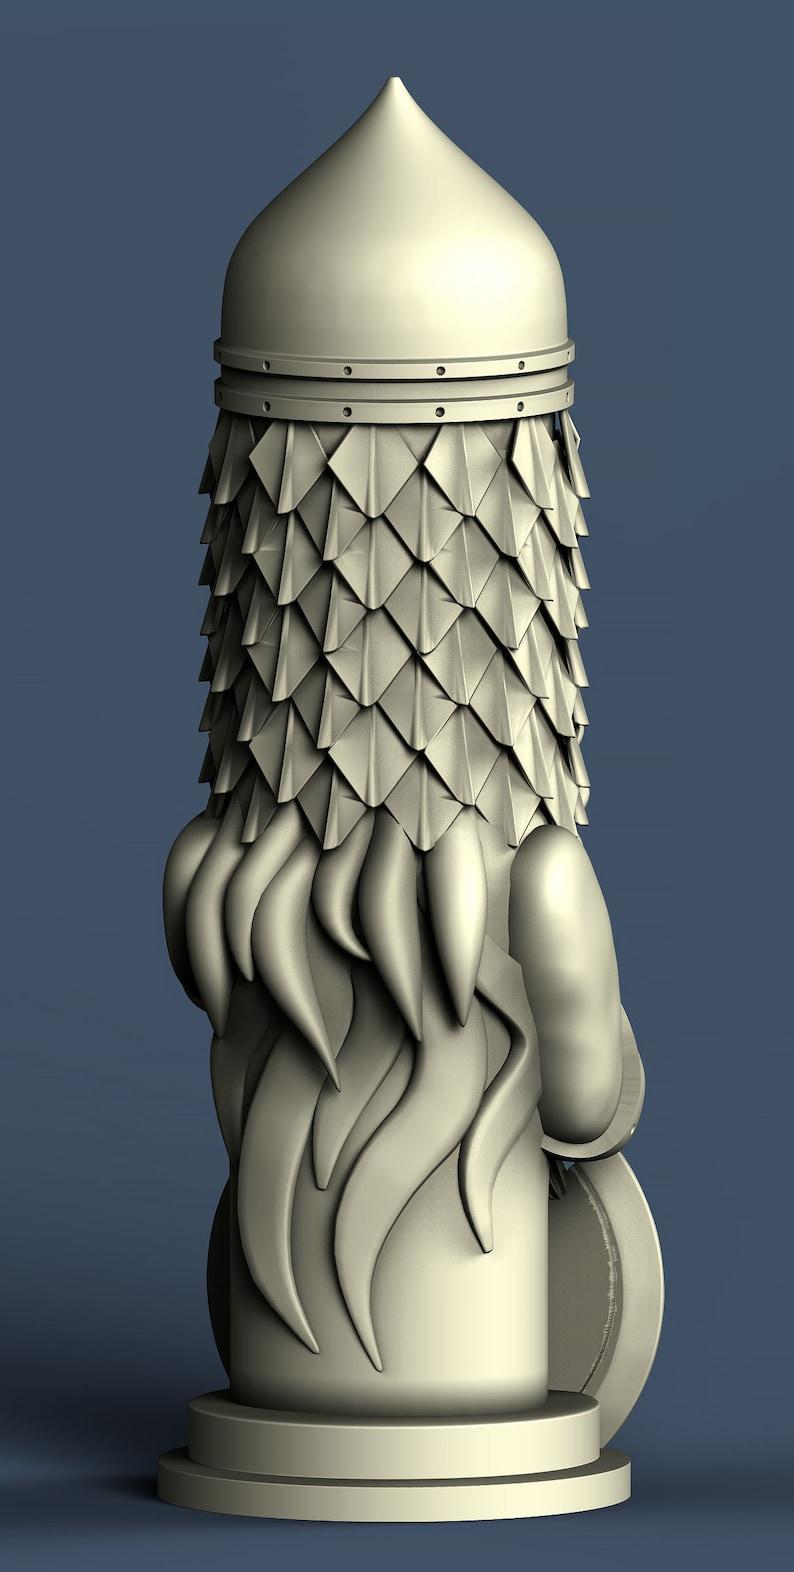 3D STL model for CNC Warrior